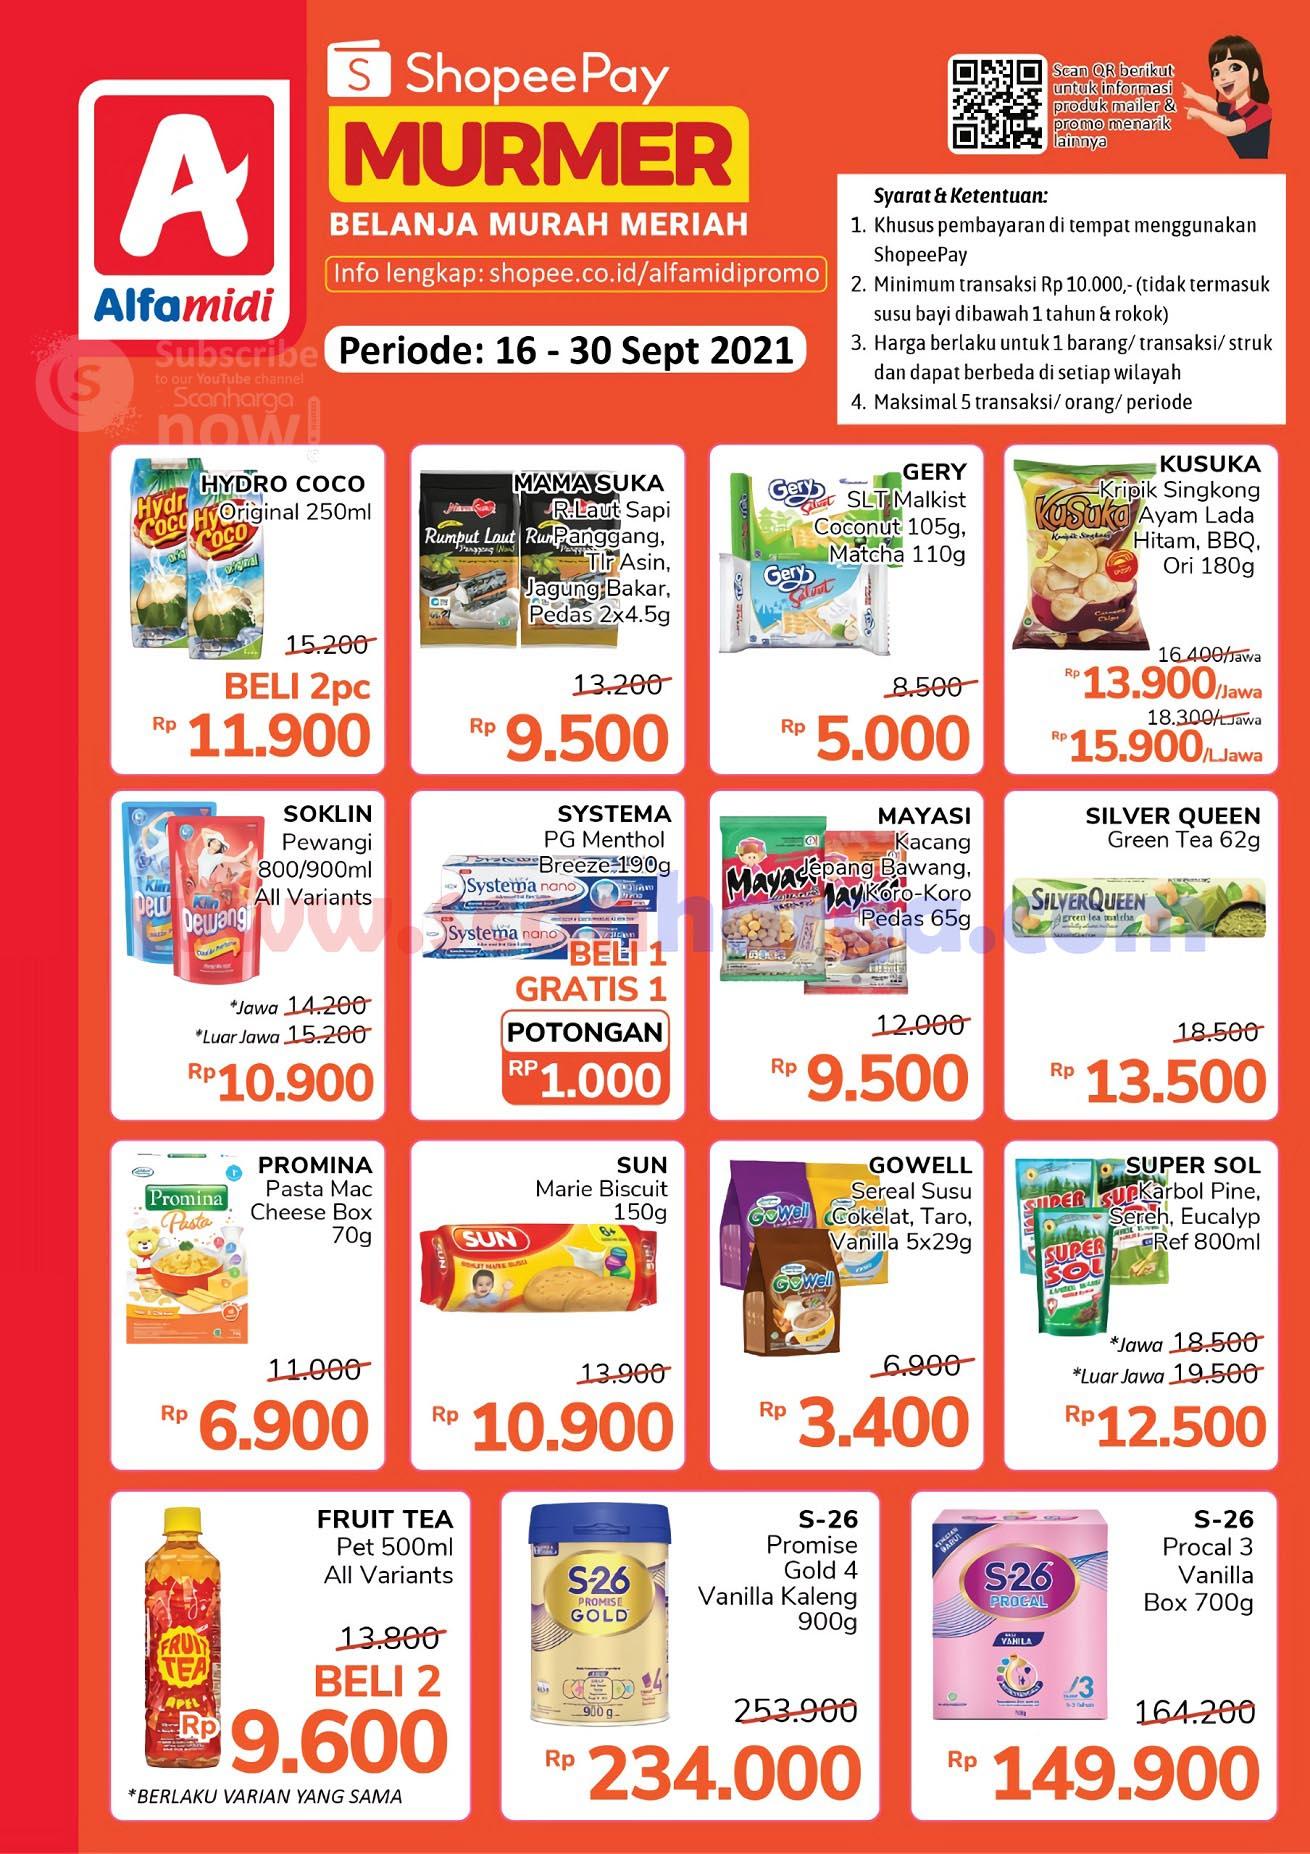 Promo Shopeepay Alfamidi Periode 16 - 30 September 2021